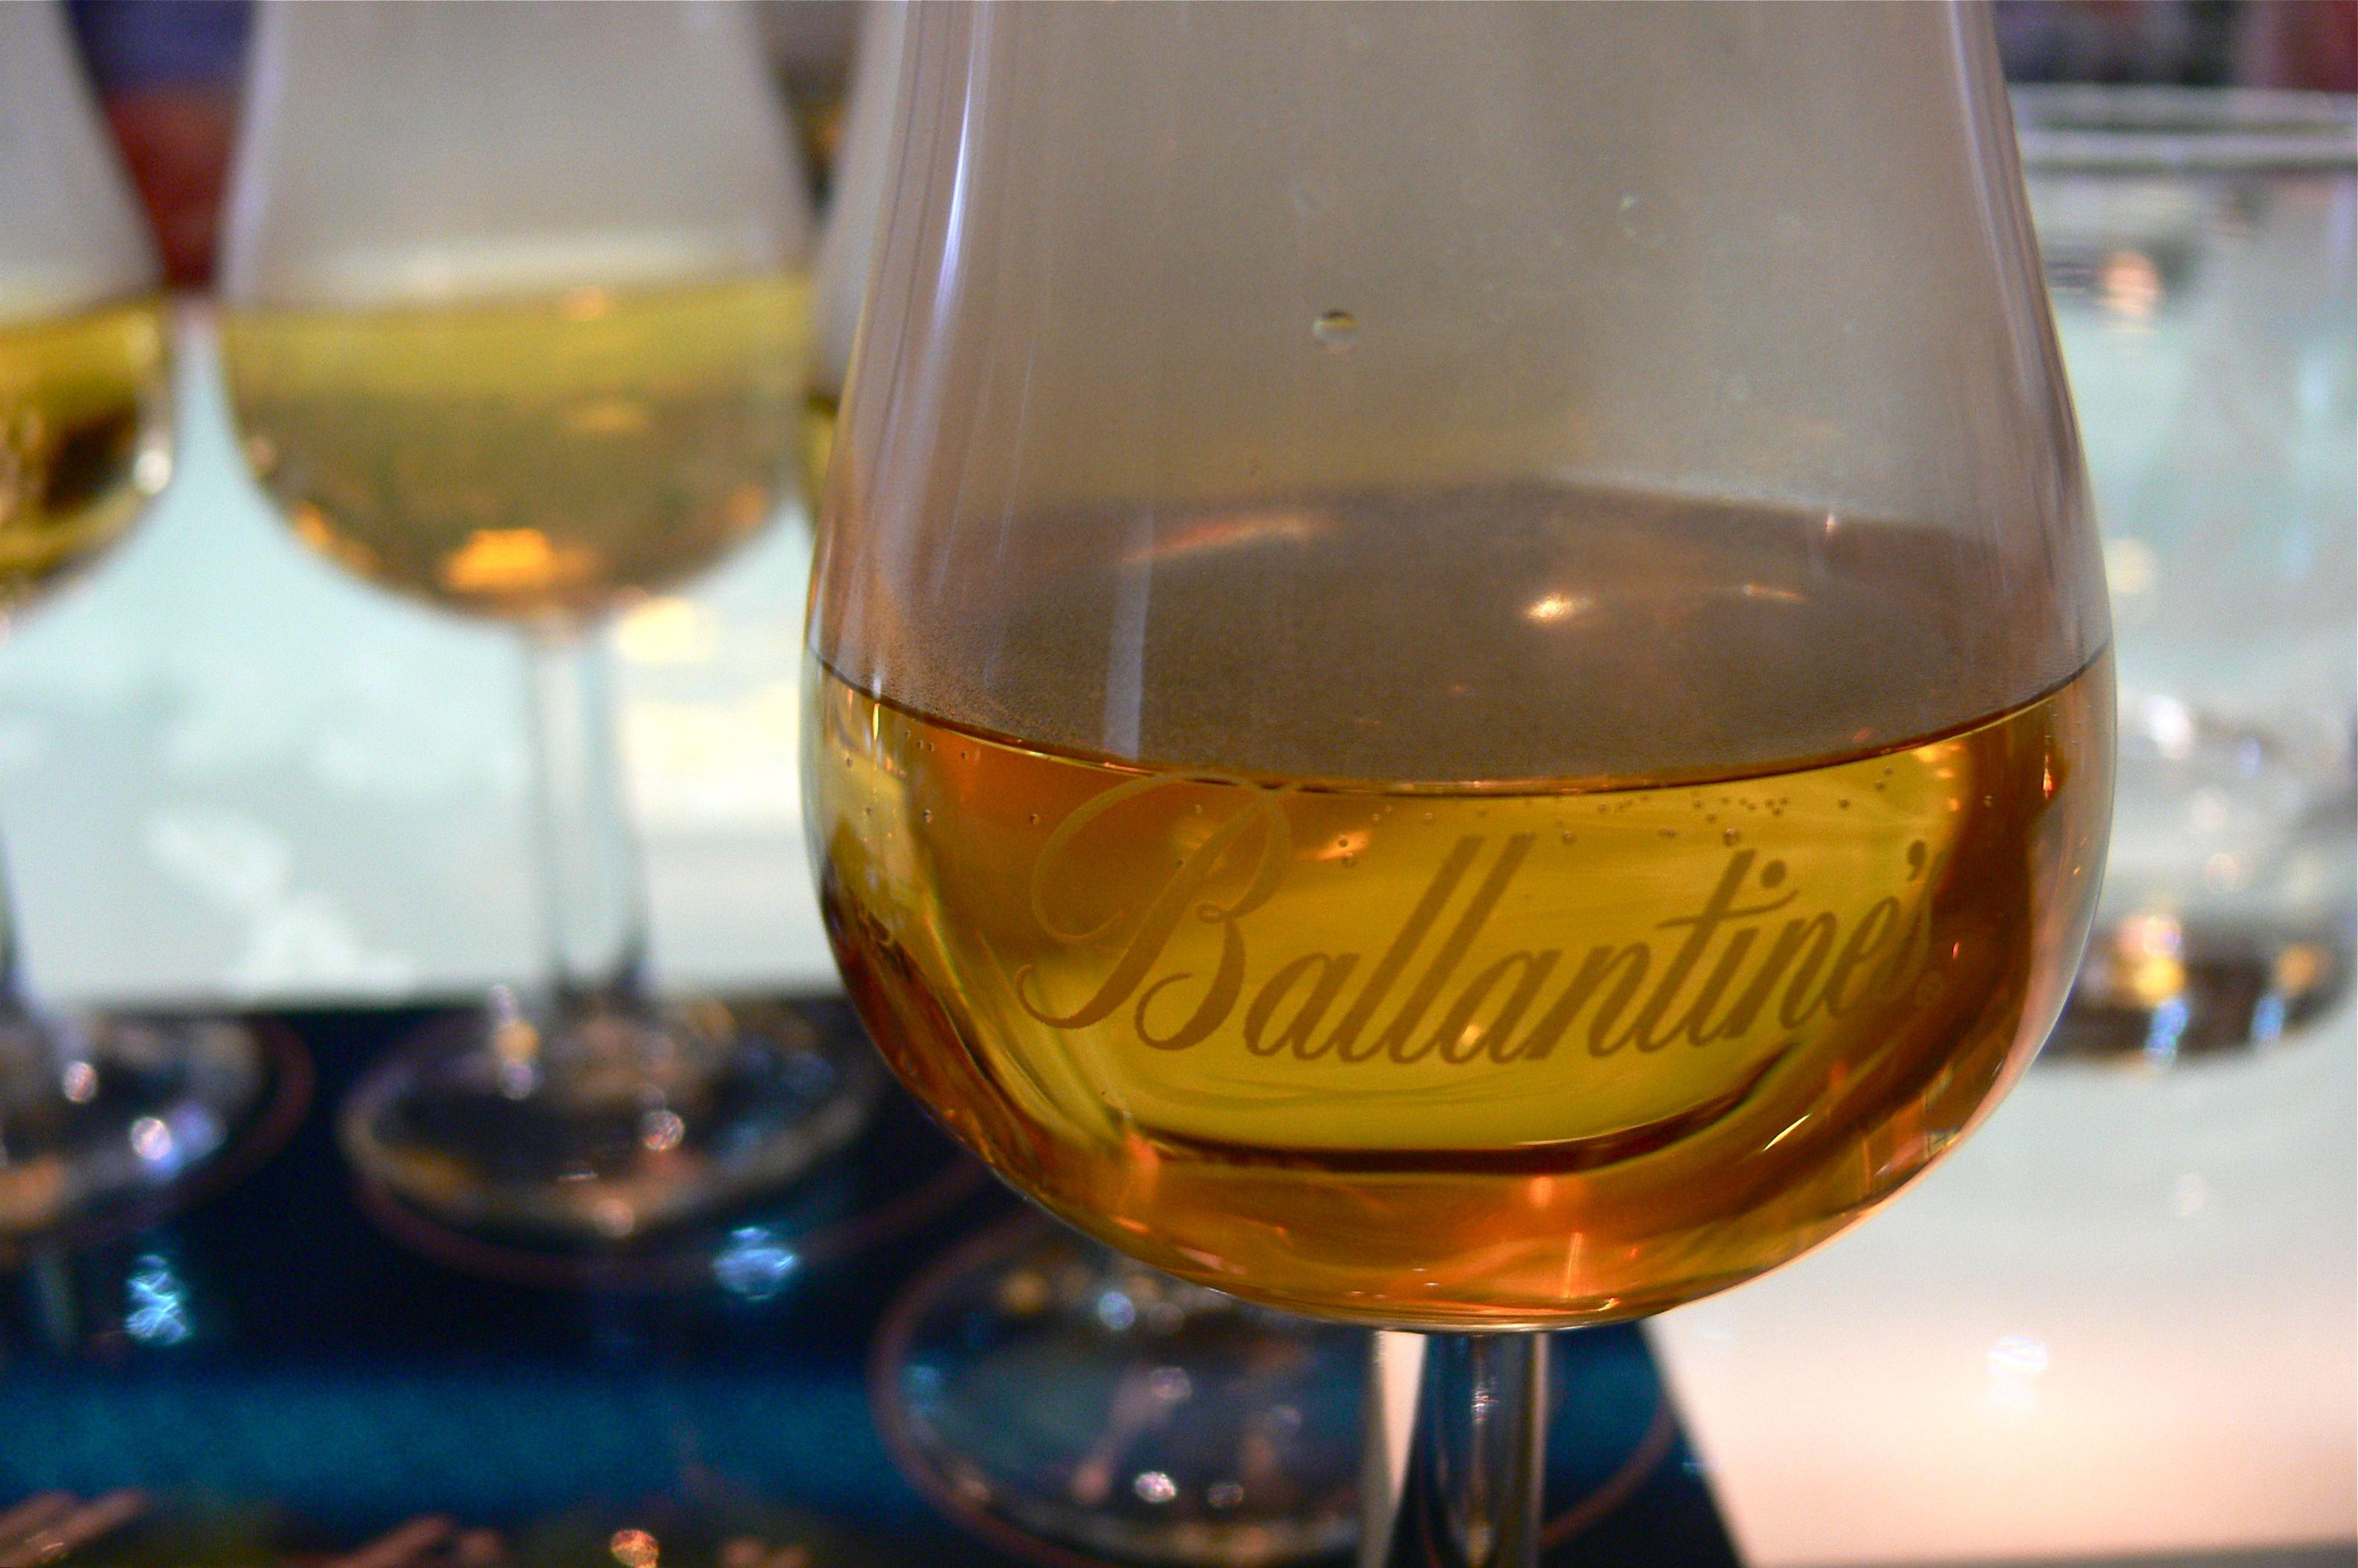 Ballantine's in a glass at Glenburgie distillery